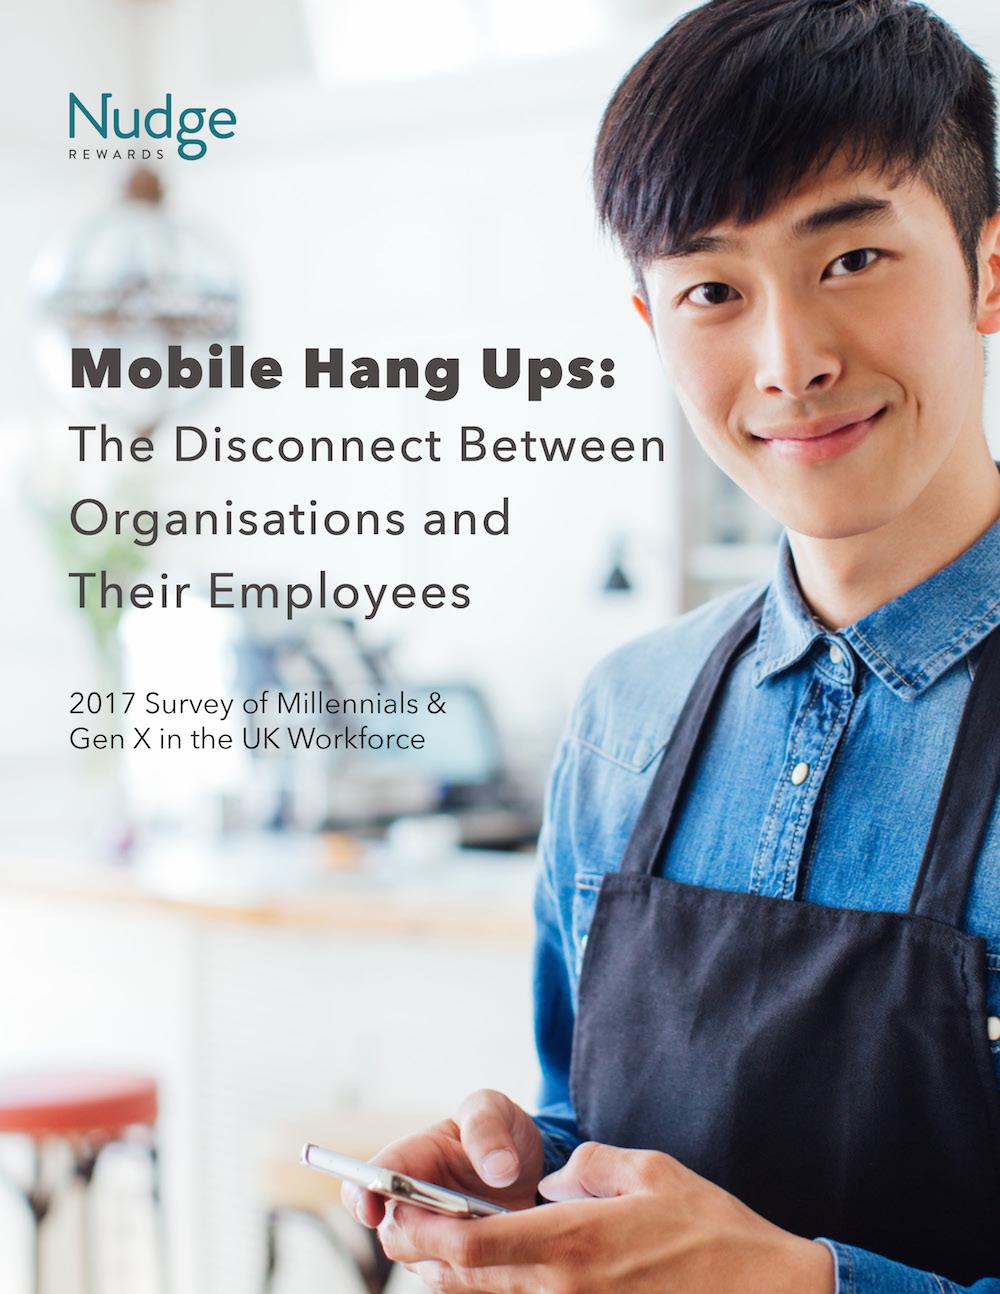 Mobile HangUps